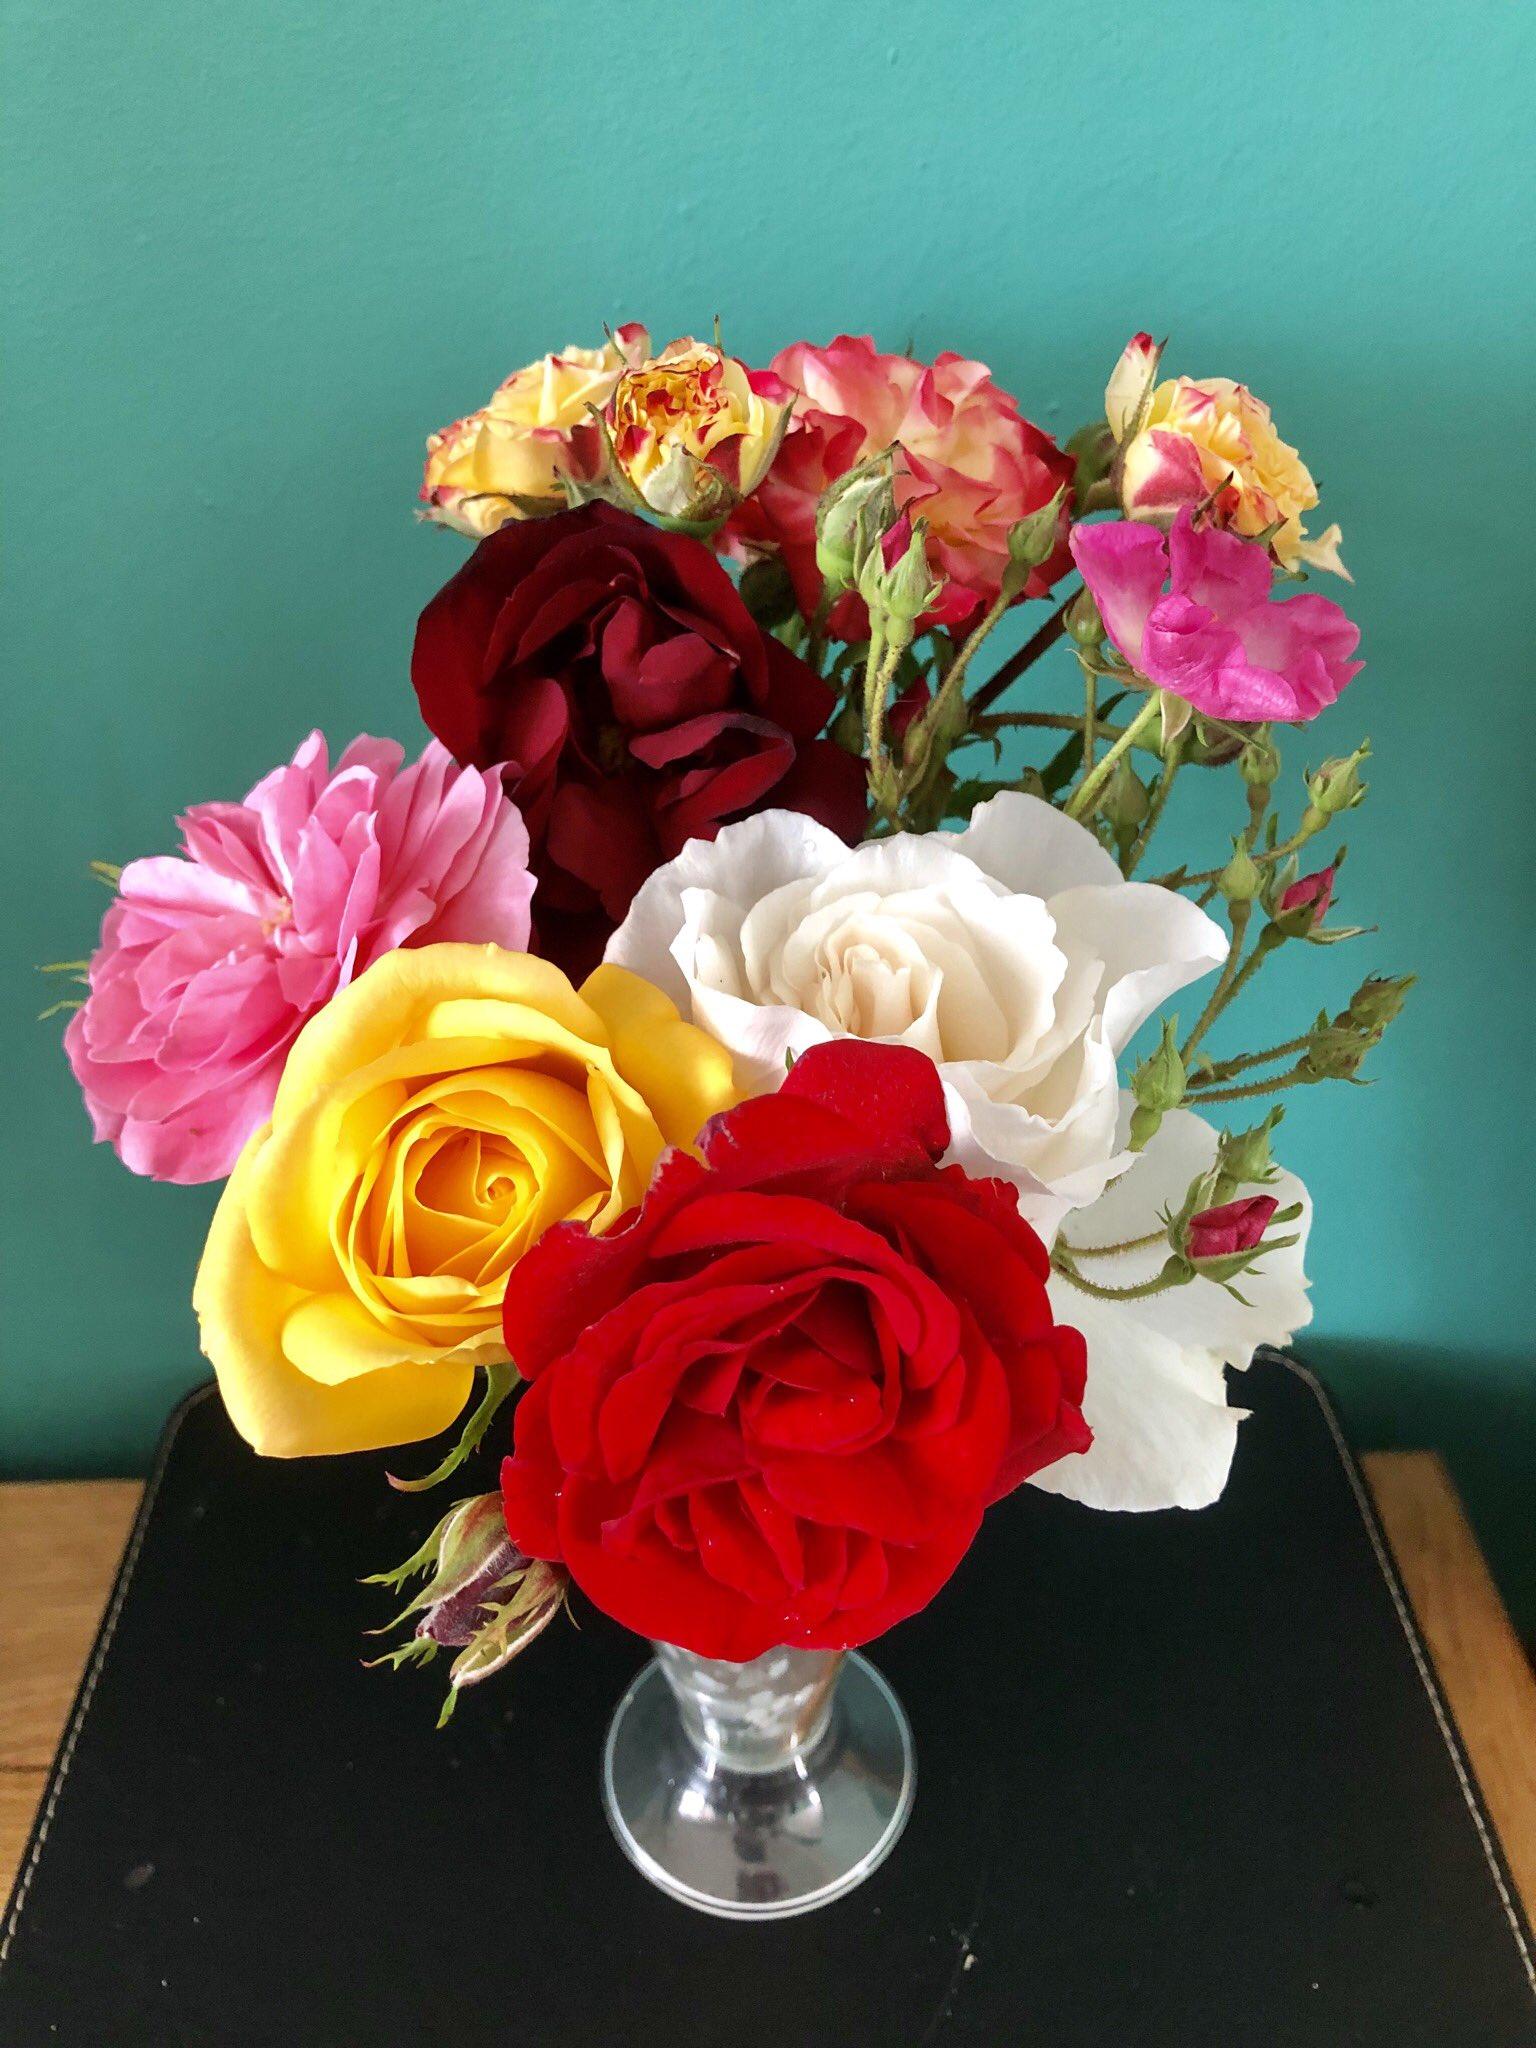 7 Days 7 Roses